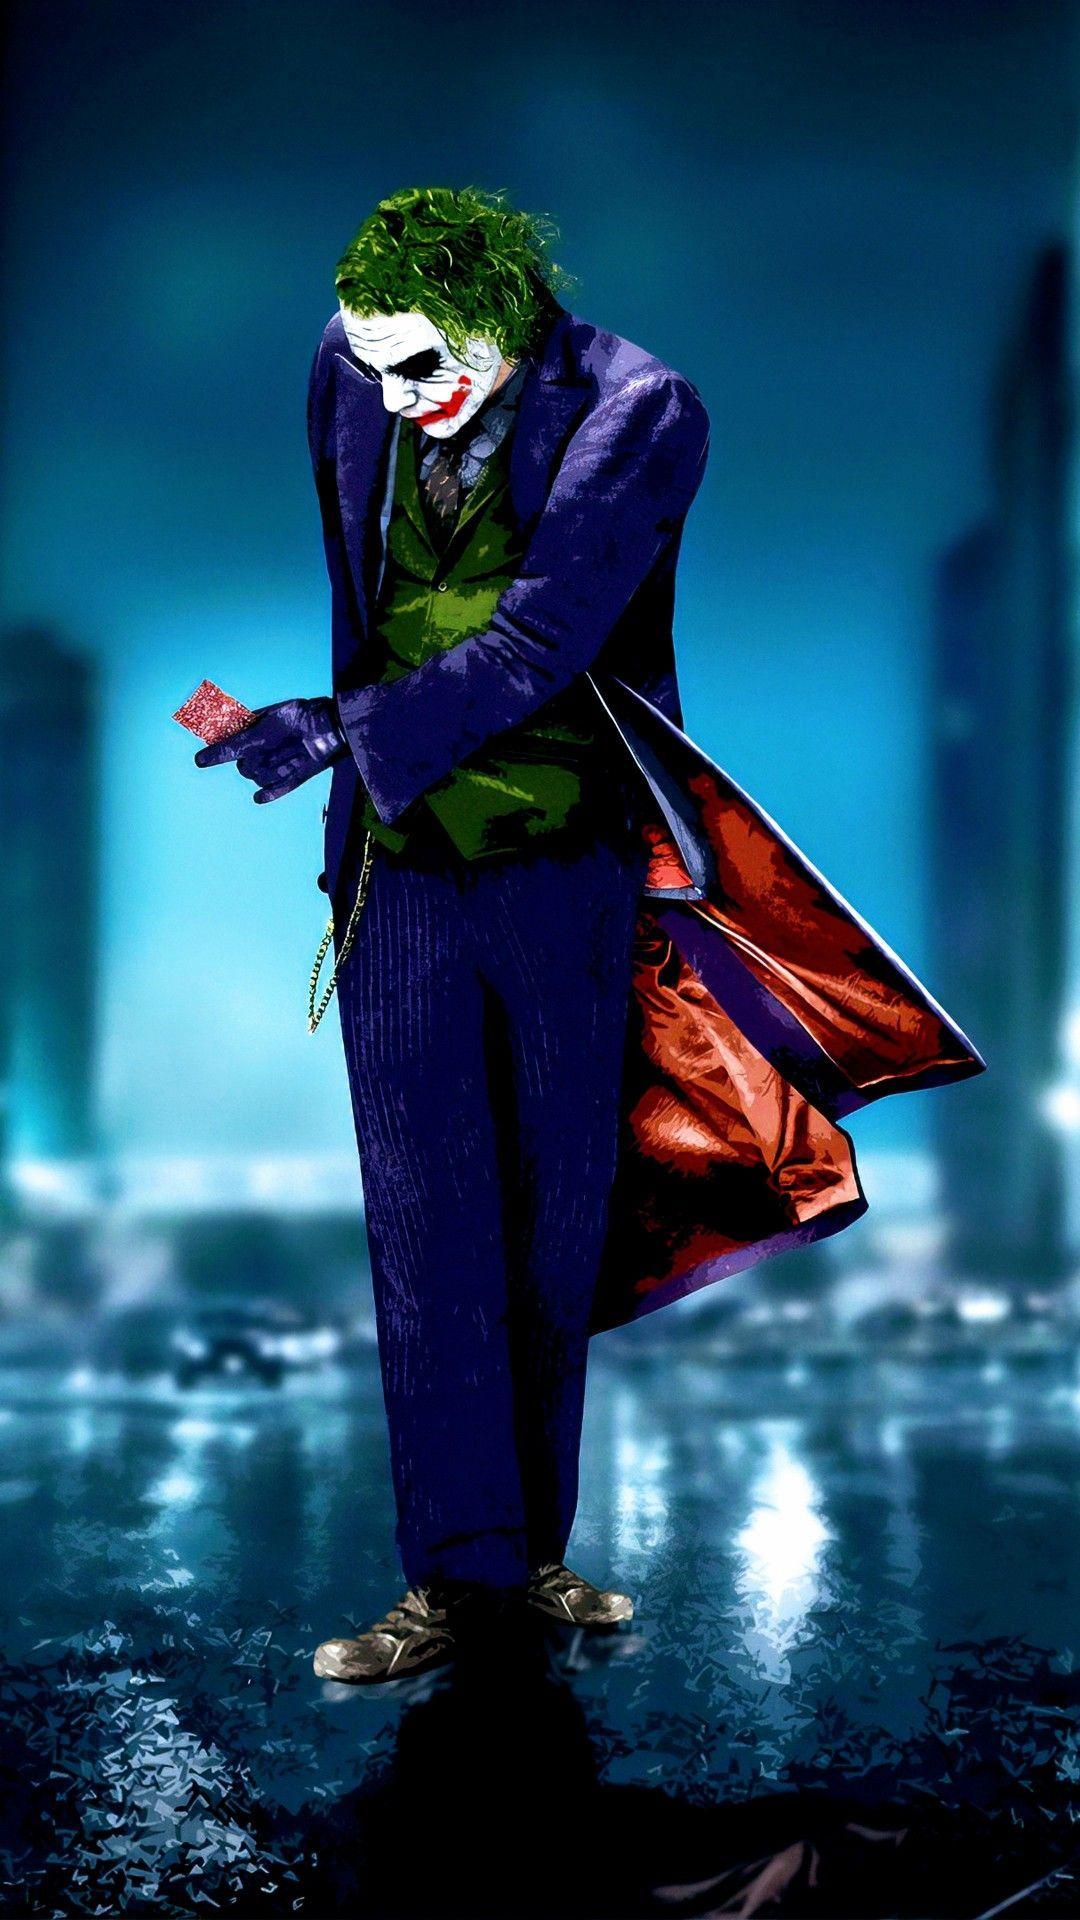 Heath Ledger Joker Hintergrundbilder Hdqwalls Com Joker Wallpapers Heath Ledger Joker Heath Ledger Joker Wallpaper